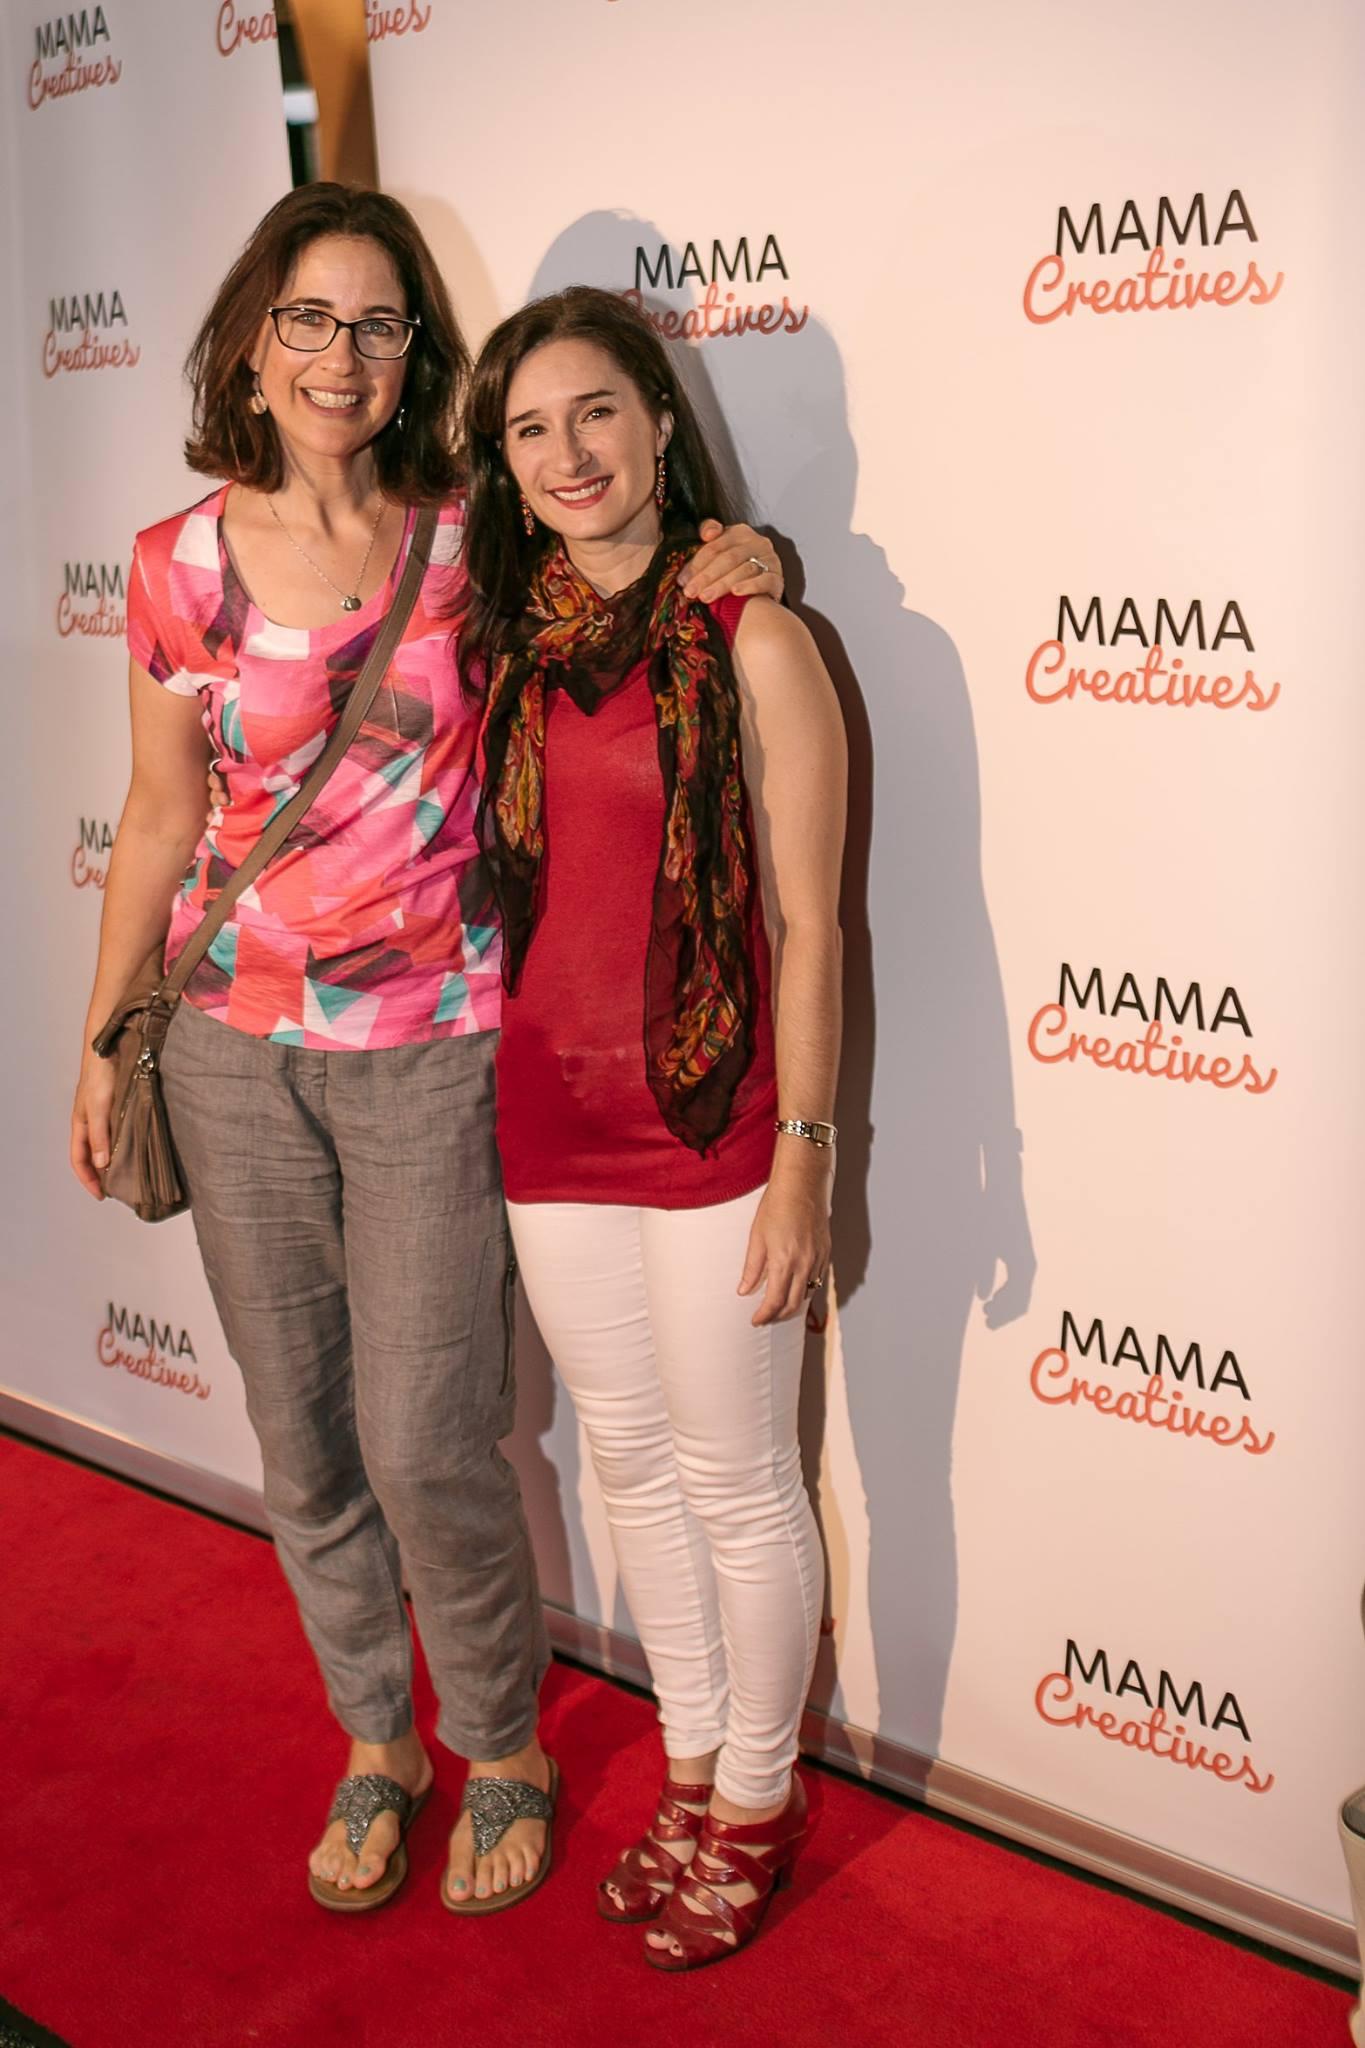 Gorgeous mamas